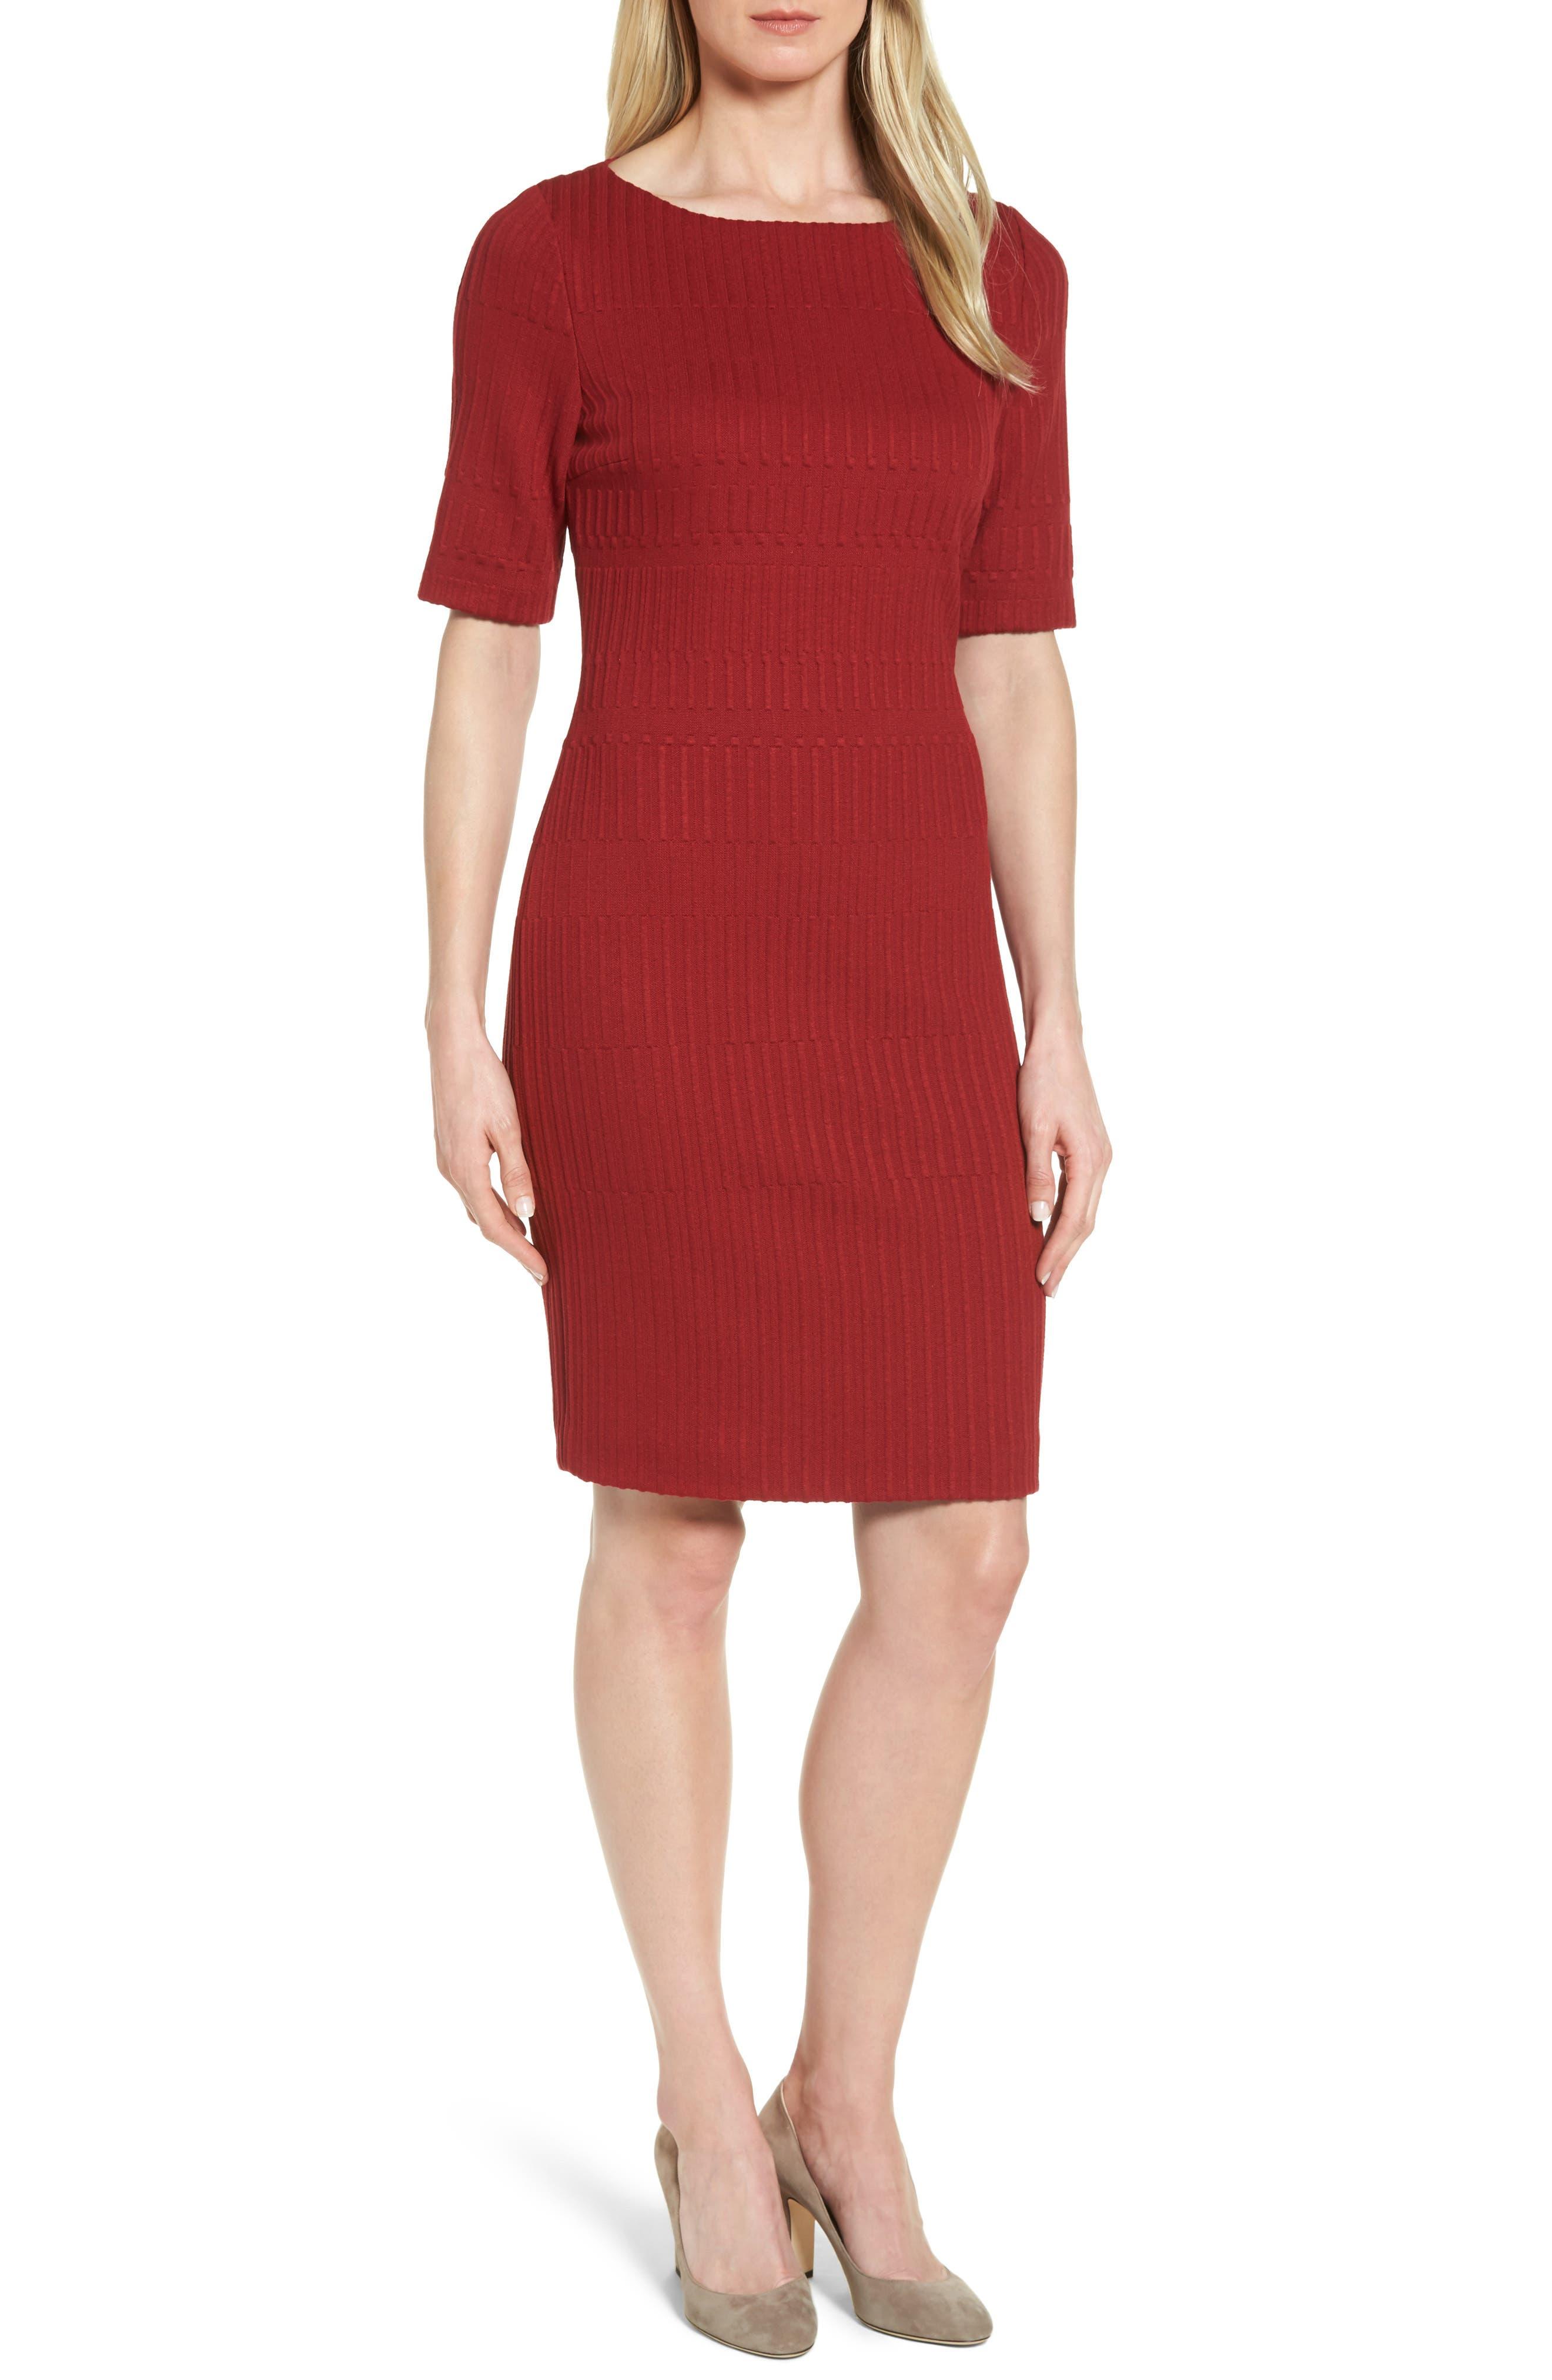 Hadea Knit Sheath Dress,                         Main,                         color, Pomegranate